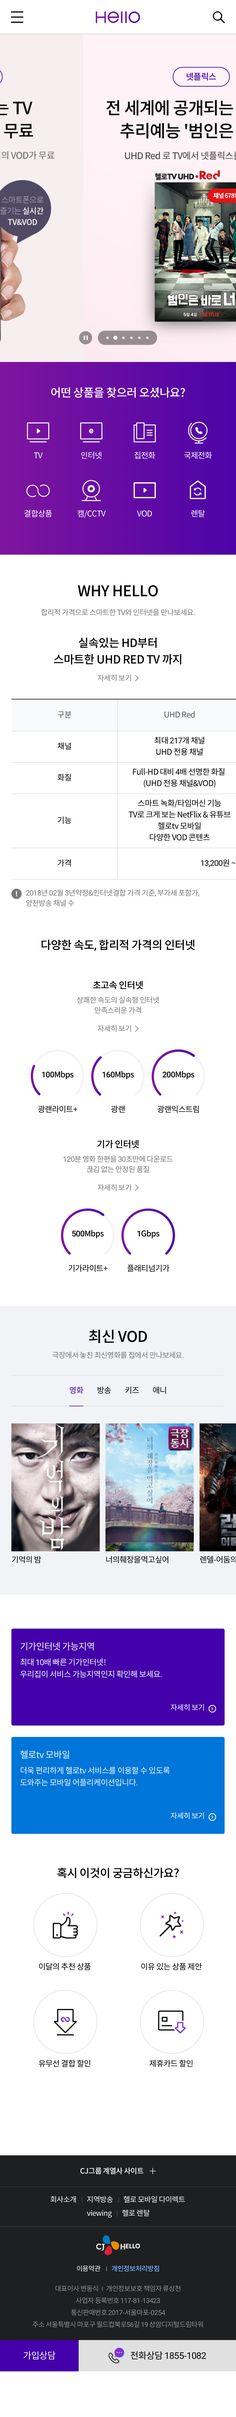 CJ Hello 서브메인 1